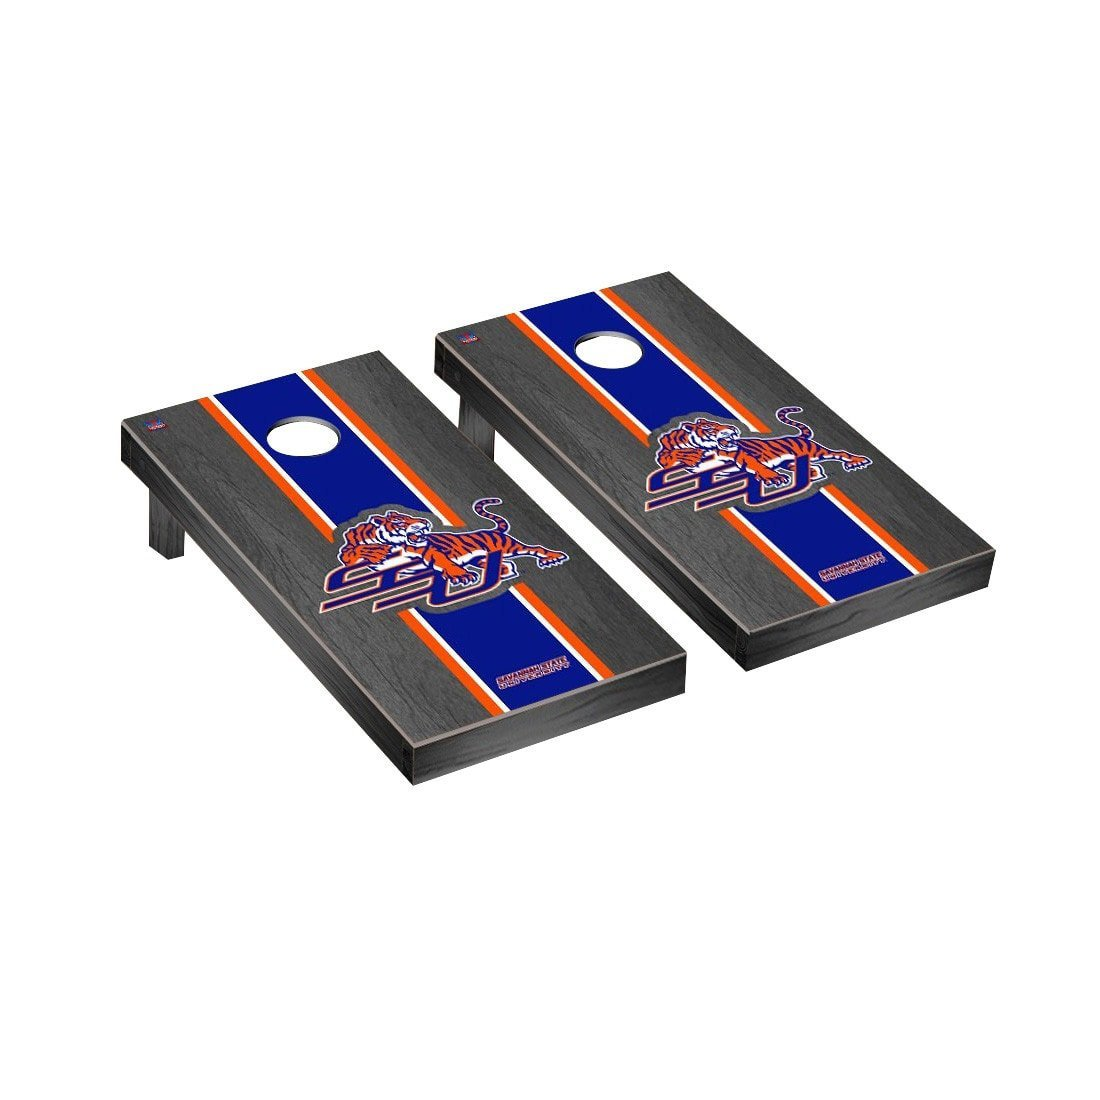 Victory Tailgate Savannah State Tigers Regulation Cornhole Game Set Onyx Stained Stripe Version